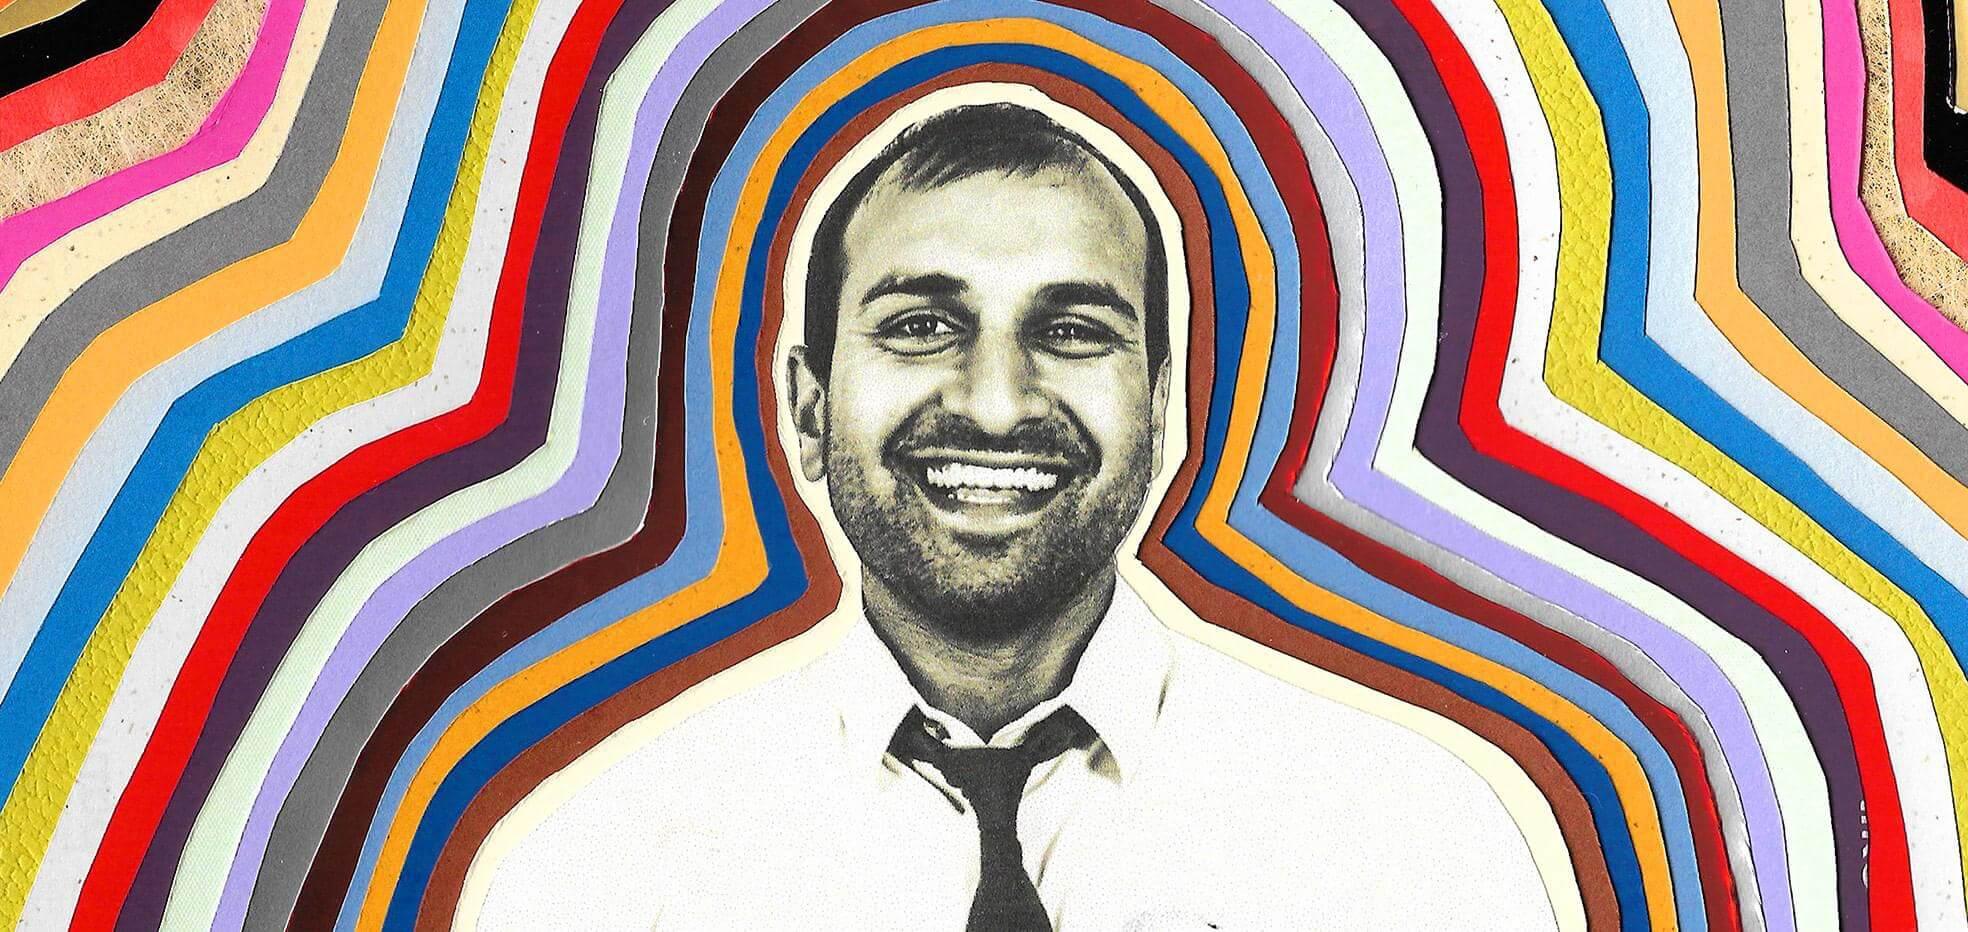 Veteran SaaS marketer Sujan Patel